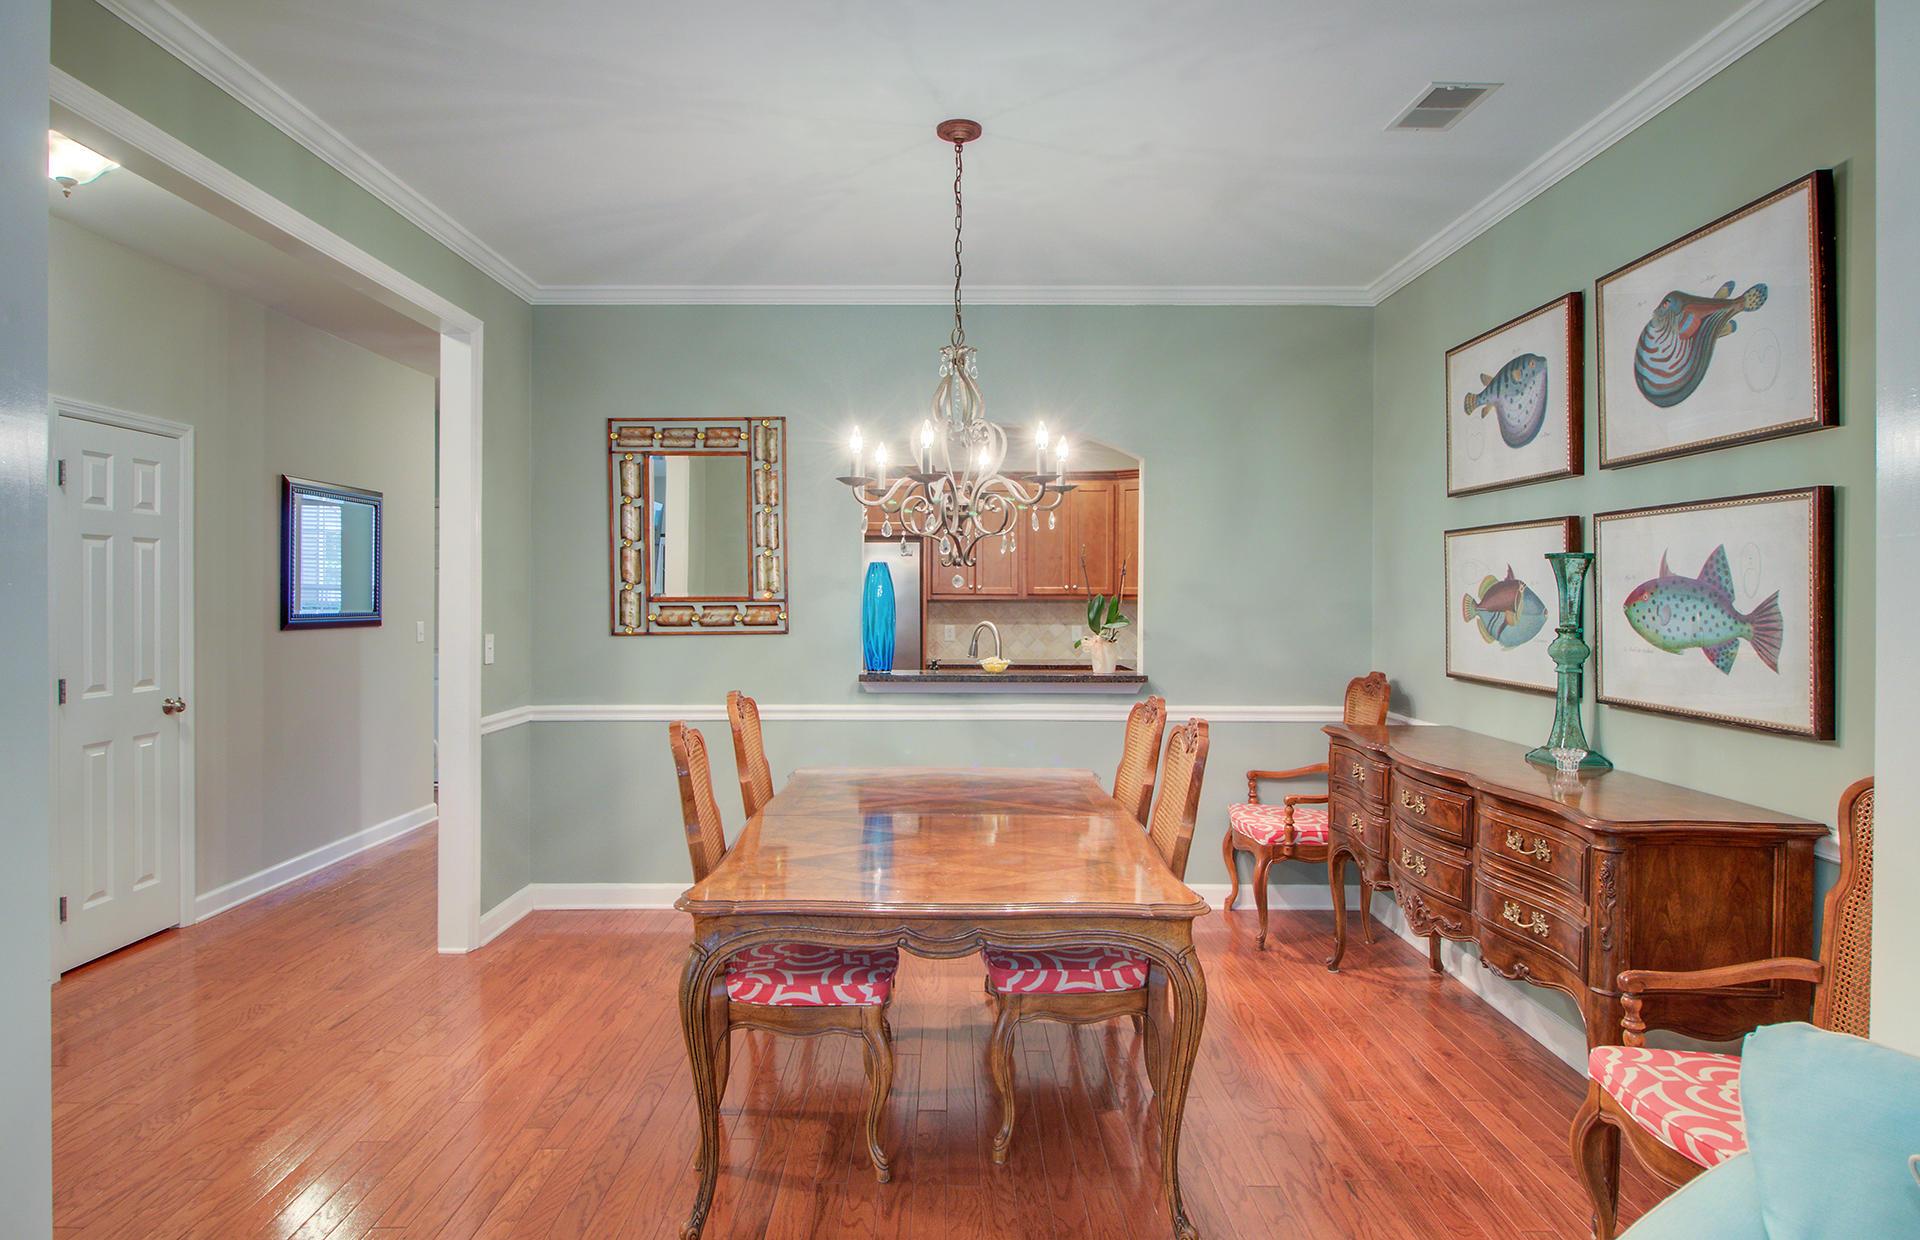 Dunes West Homes For Sale - 145 Fresh Meadow, Mount Pleasant, SC - 14